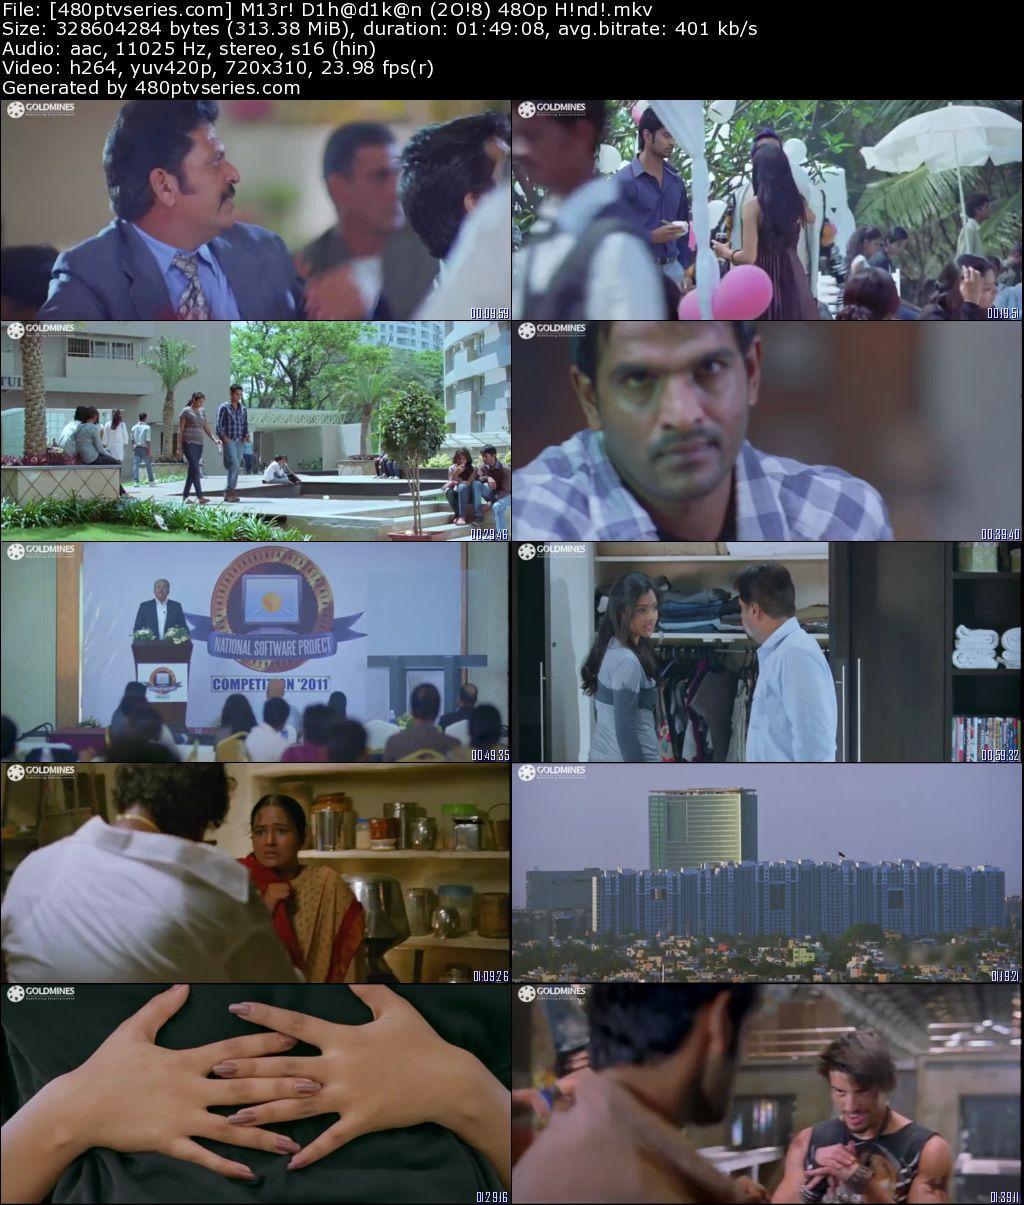 Meri Dhadkan (2018) 300MB Full Hindi Dubbed Movie Download 480p HDRip Free Watch Online Full Movie Download Worldfree4u 9xmovies